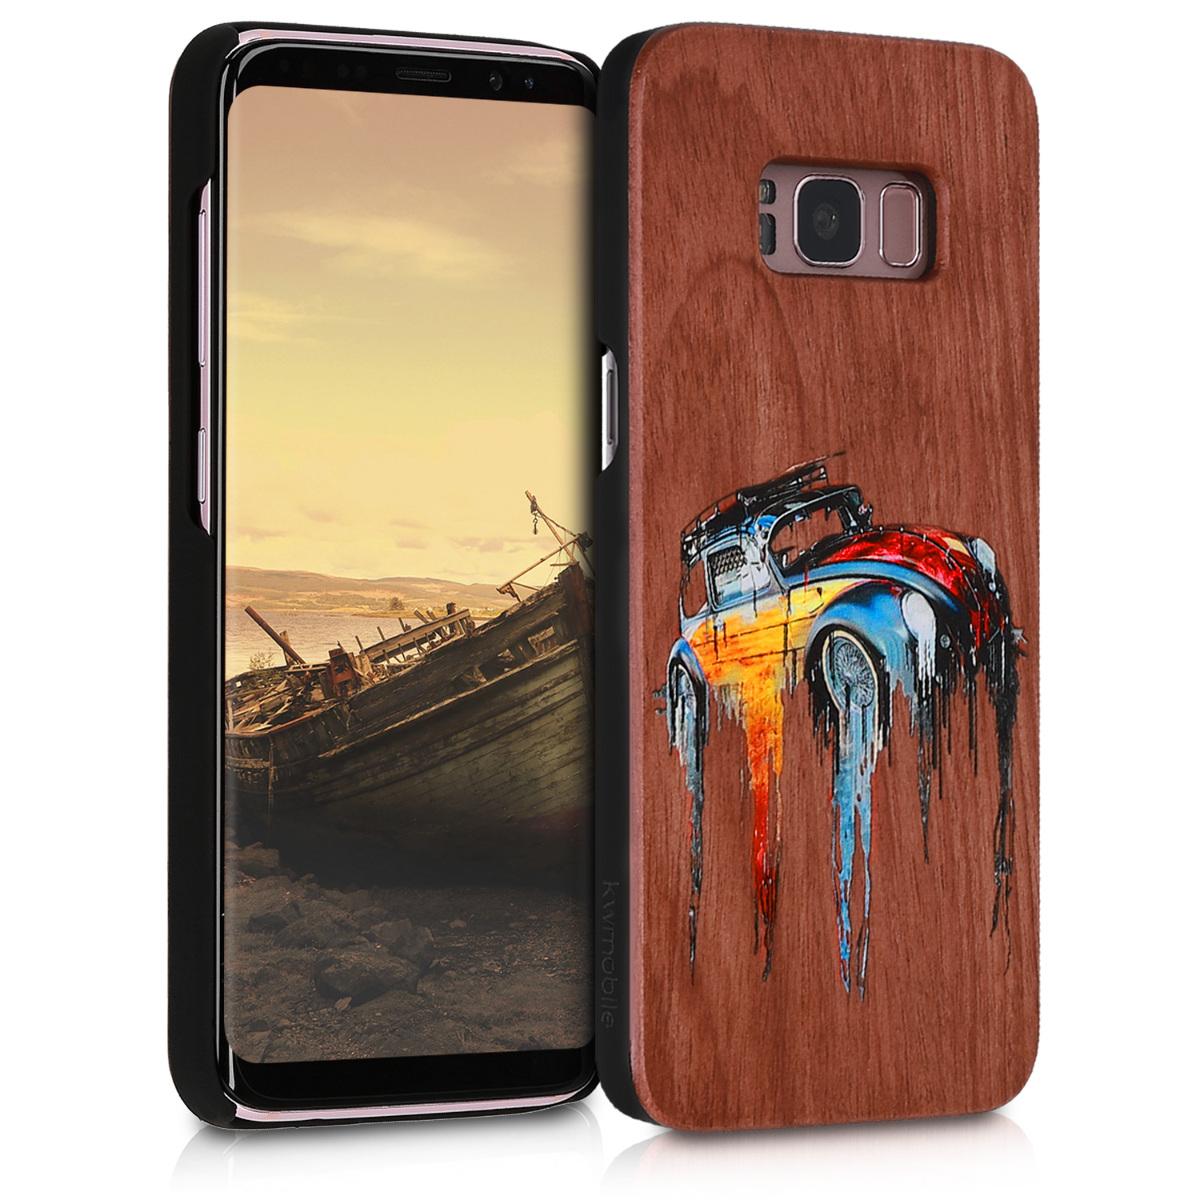 KW Ξύλινη Θήκη Samsung Galaxy S8 - Καφέ/ Πολύχρωμο αμάξι (46074.04)